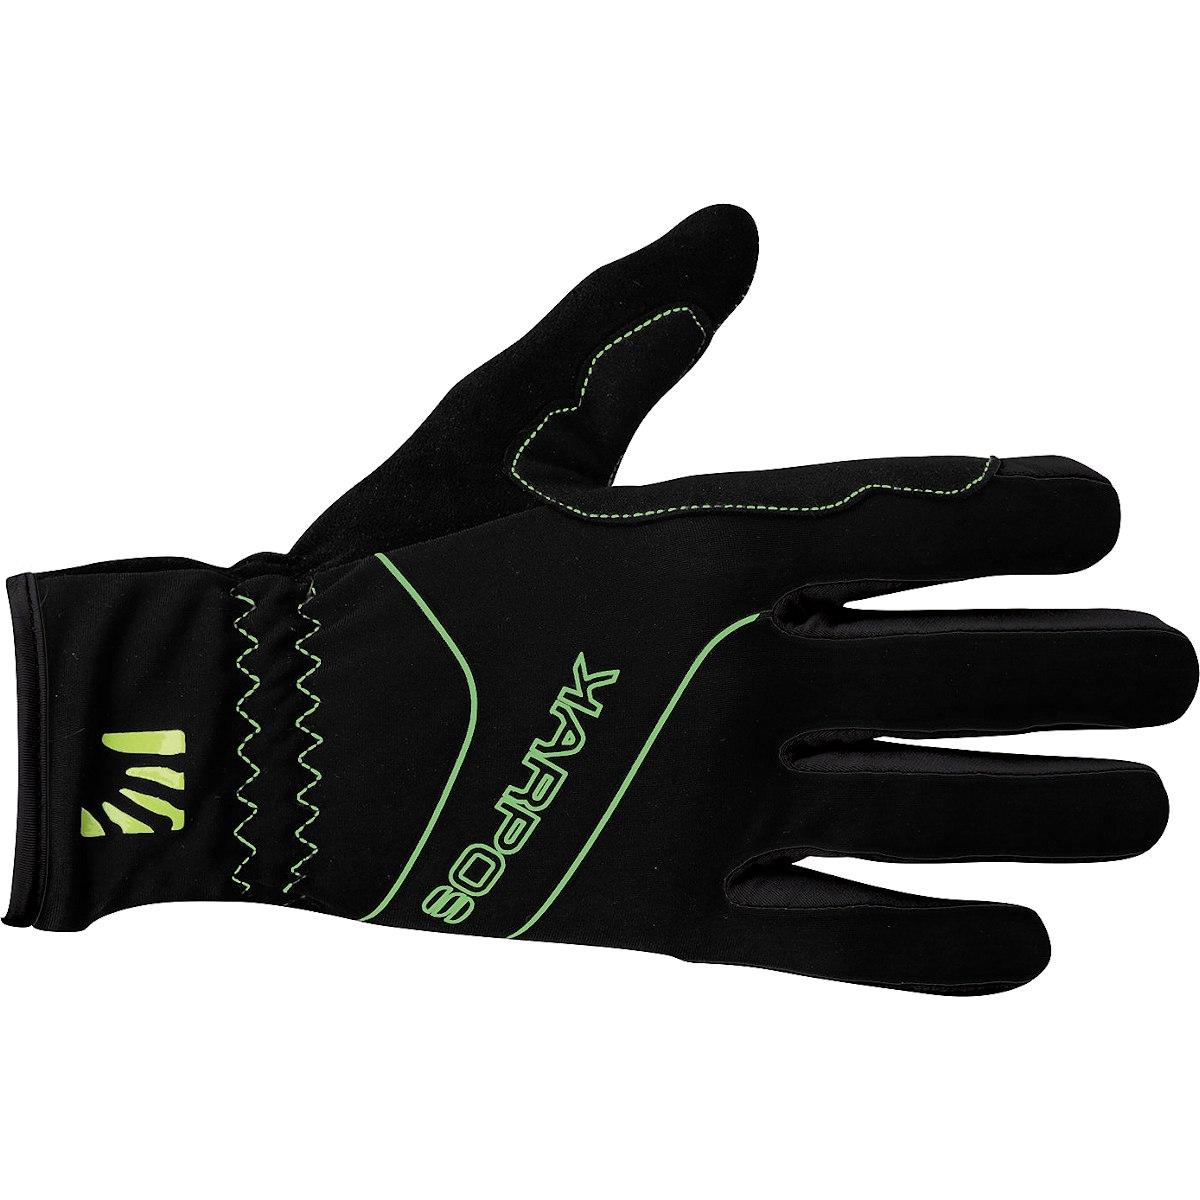 Karpos Alagna Full-Finger Glove - Black/Green Fluo